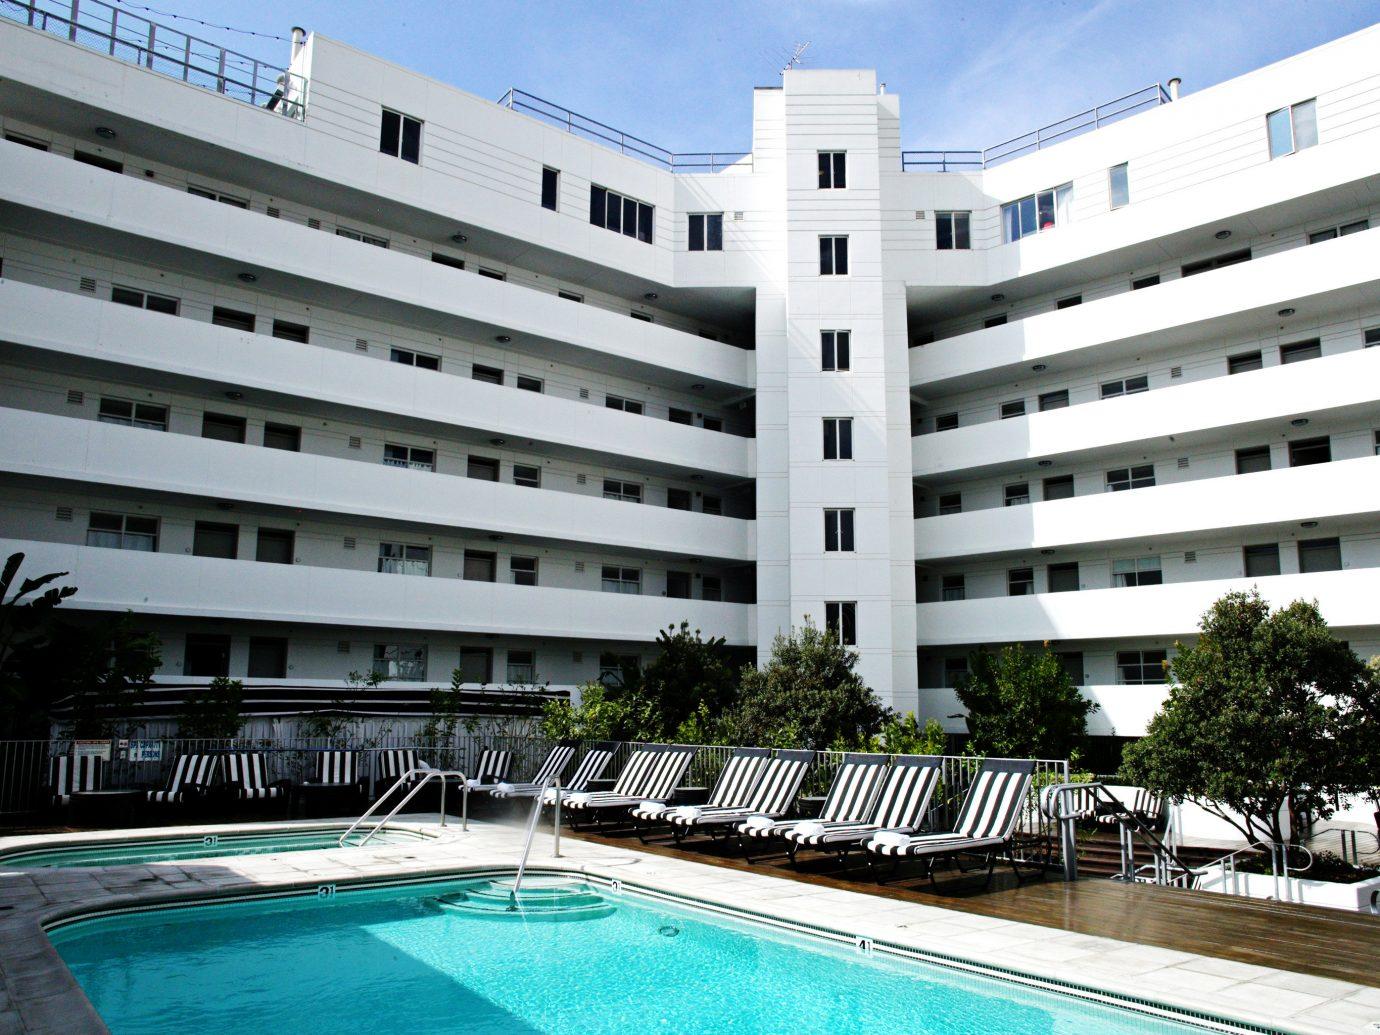 Exterior Hotels Modern Pool outdoor building condominium property plaza Resort estate real estate residential area facade apartment